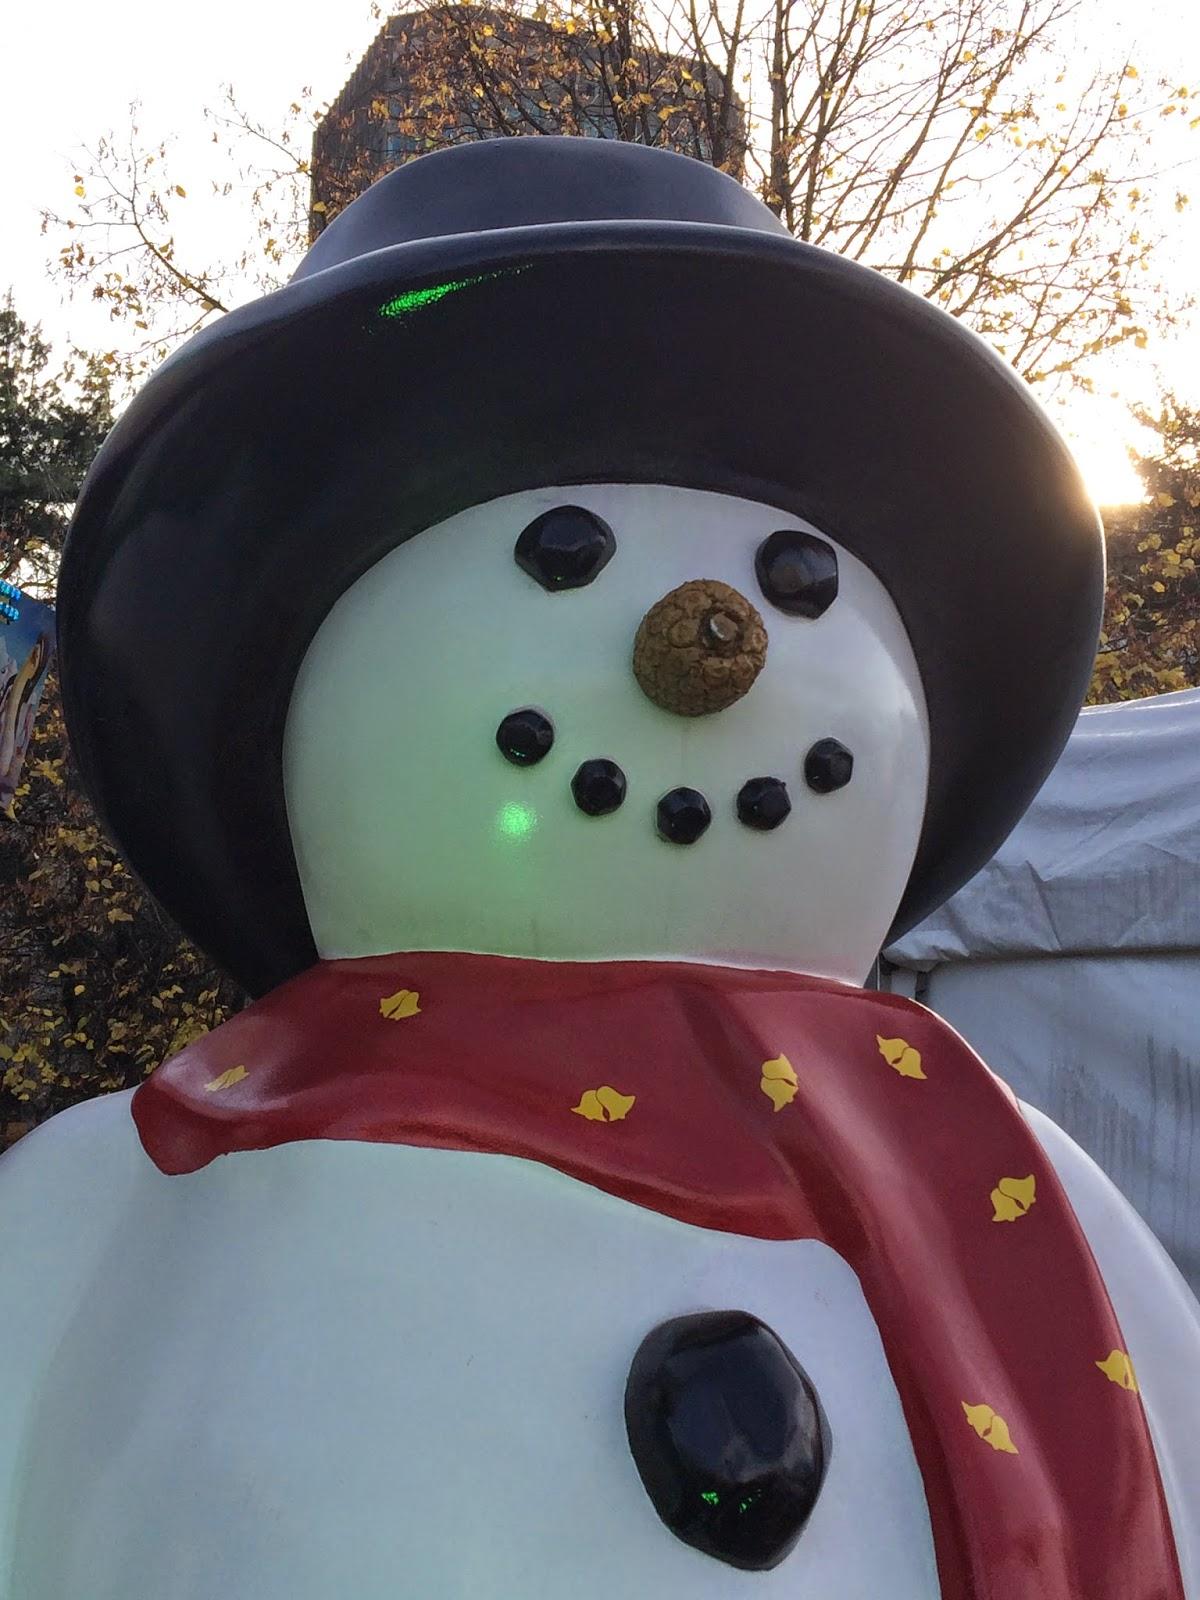 Cardiff Winter Wonderland, Wales Online, Cardiff, Ice Skating Cardiff, Christmas